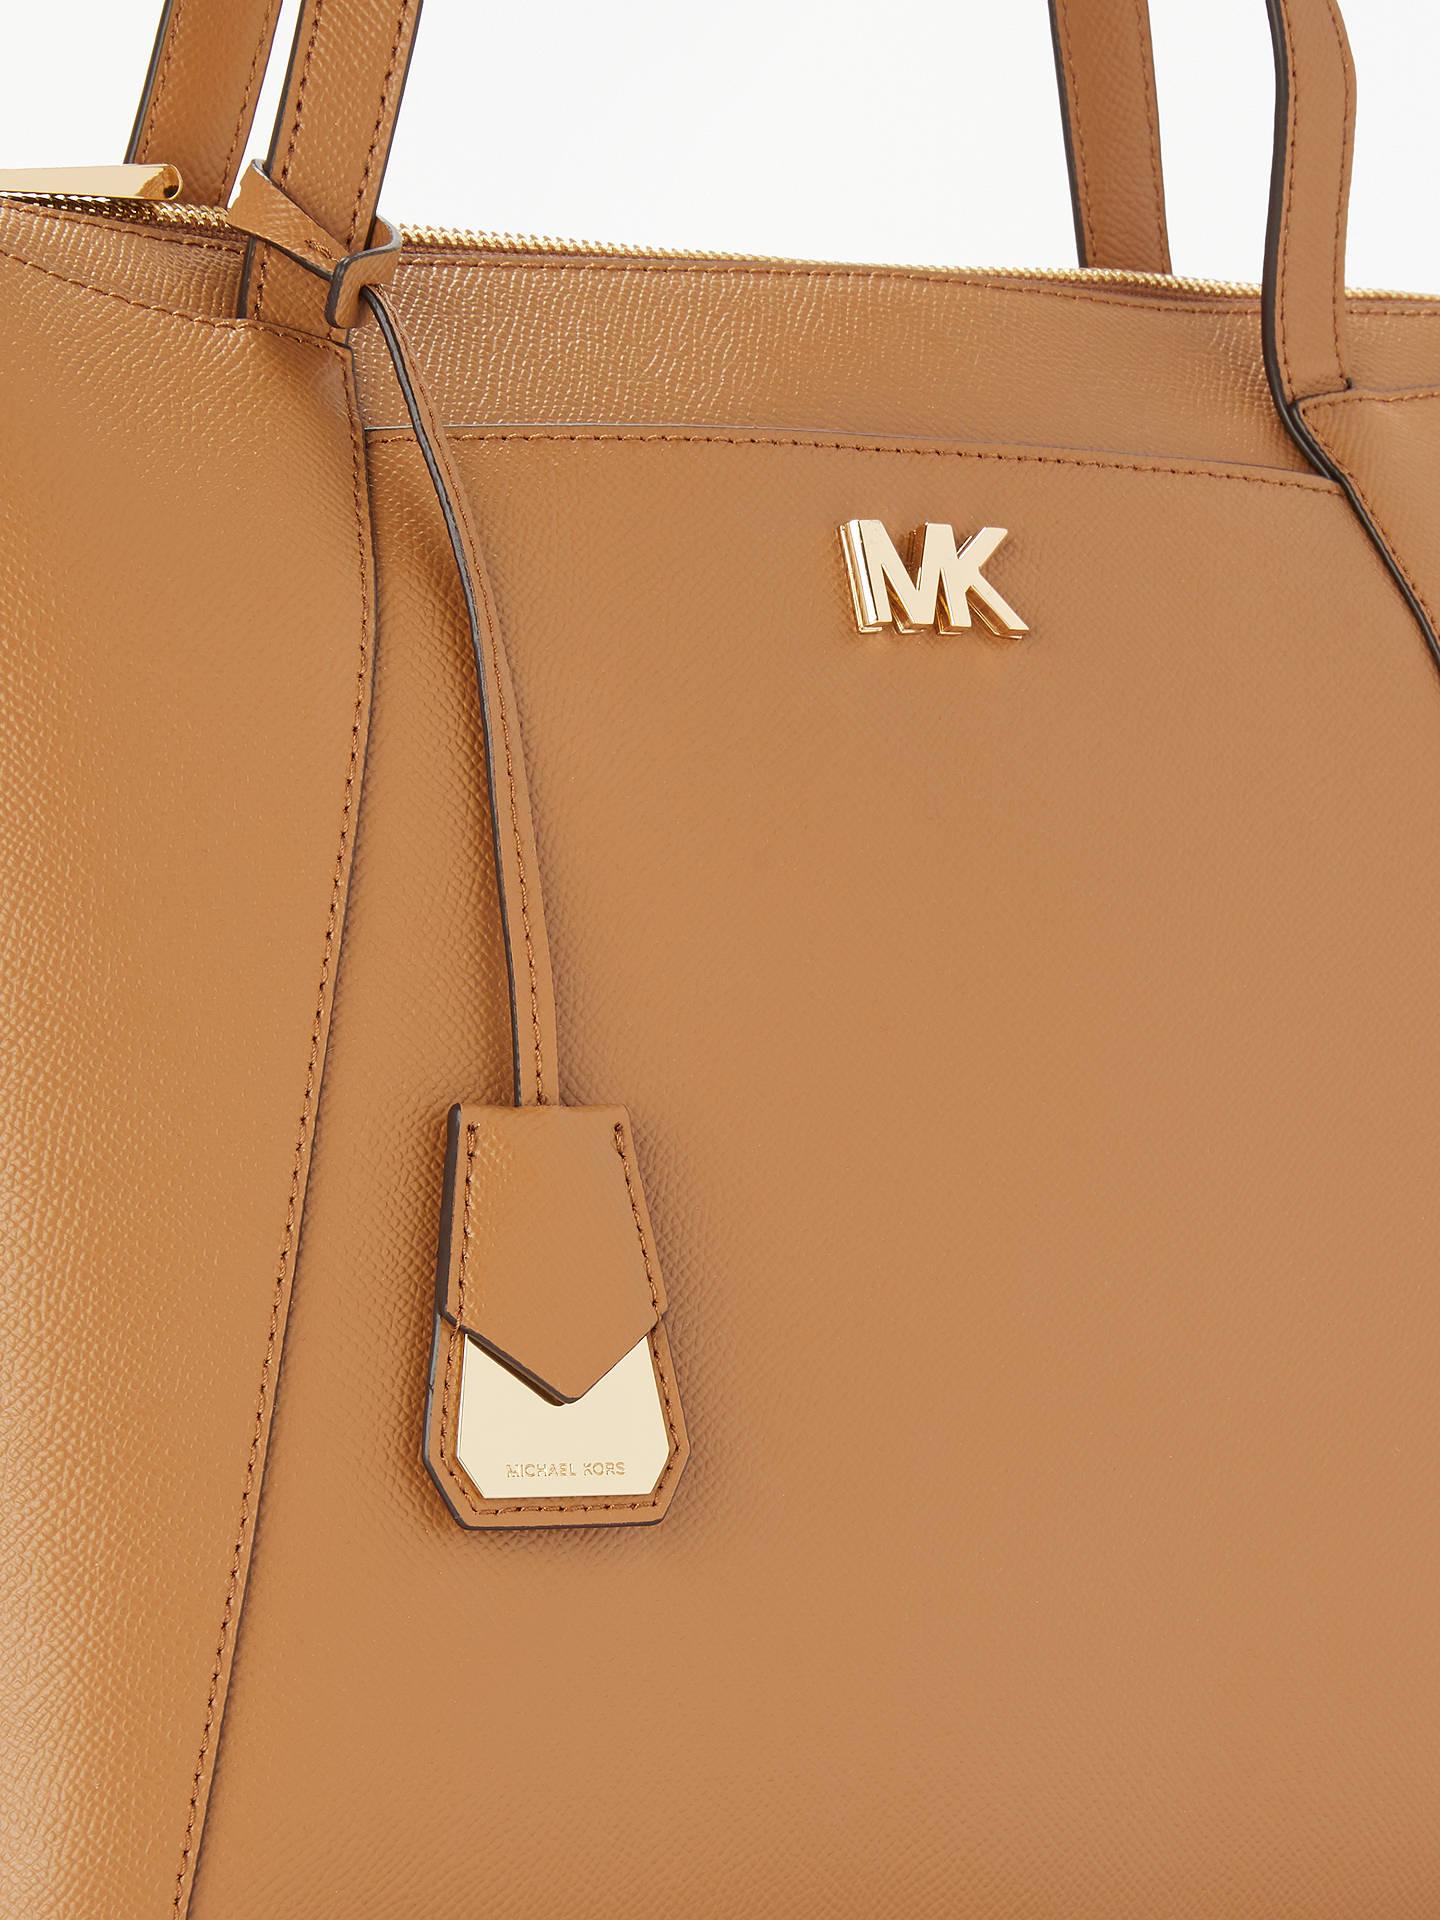 fde18648a539 ... Buy MICHAEL Michael Kors Maddie East West Medium Leather Tote Bag